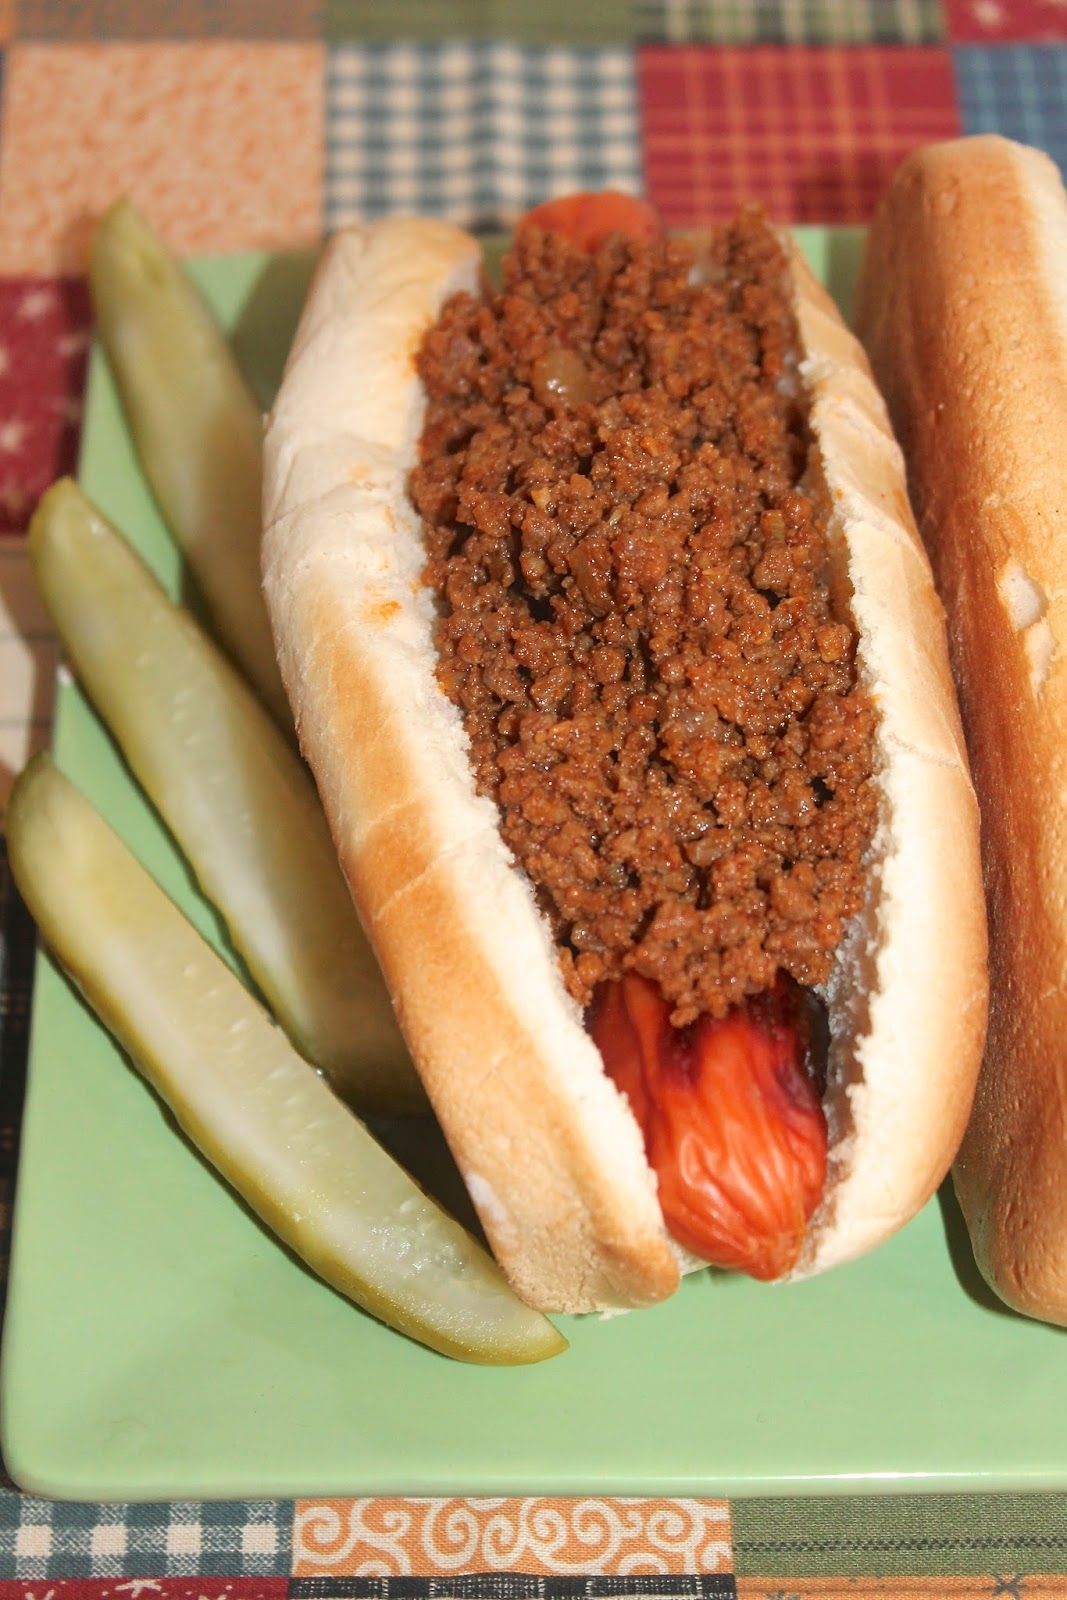 savory moments grandpa 39 s hot dog sauce. Black Bedroom Furniture Sets. Home Design Ideas